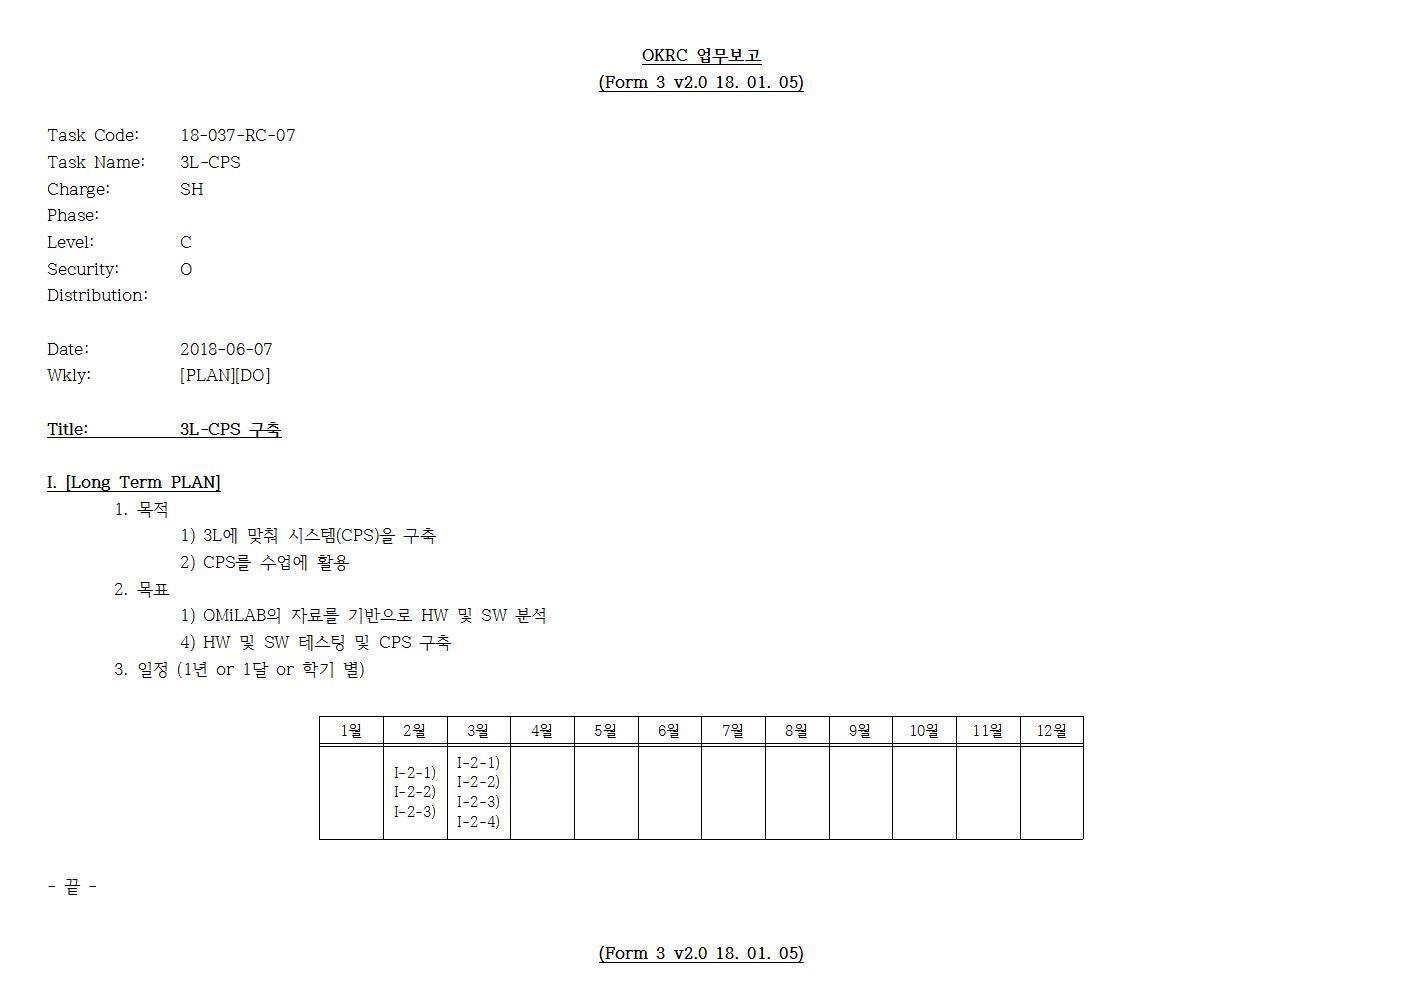 D-[18-037-RC-07]-[3L-CPS]-[2018-06-07][SH]001.jpg